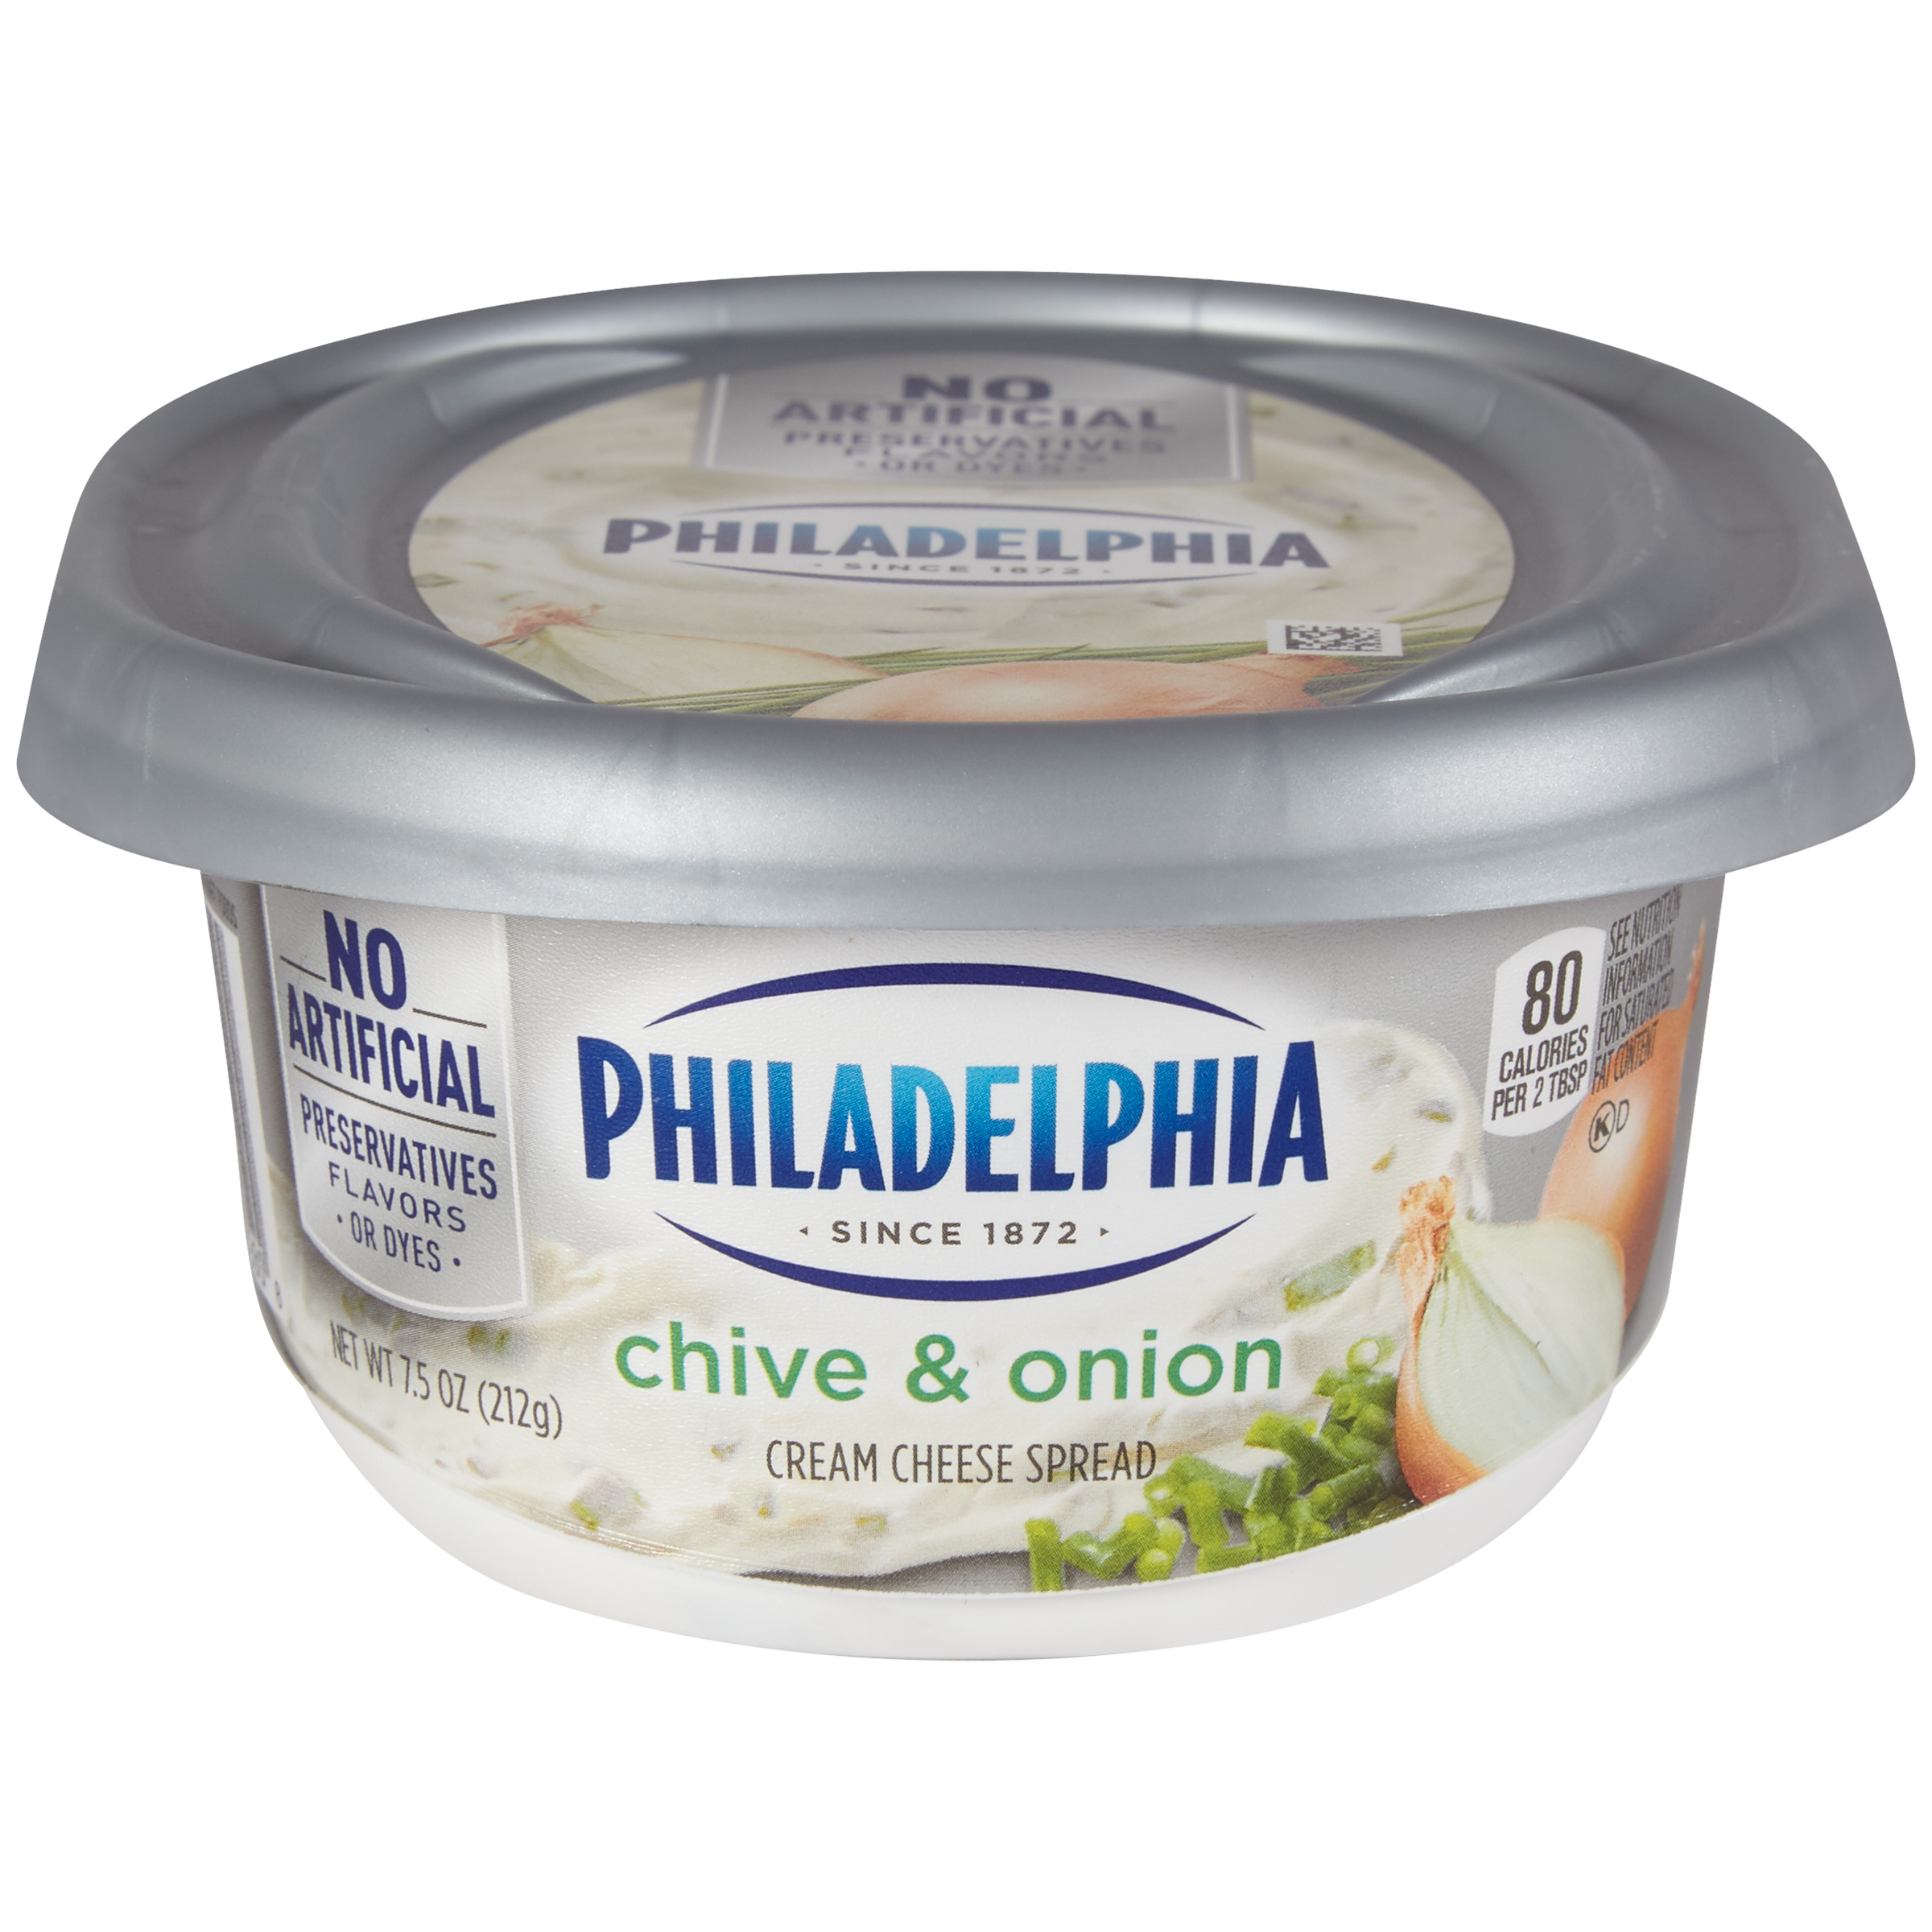 Philadelphia Chive and Onion Cream Cheese